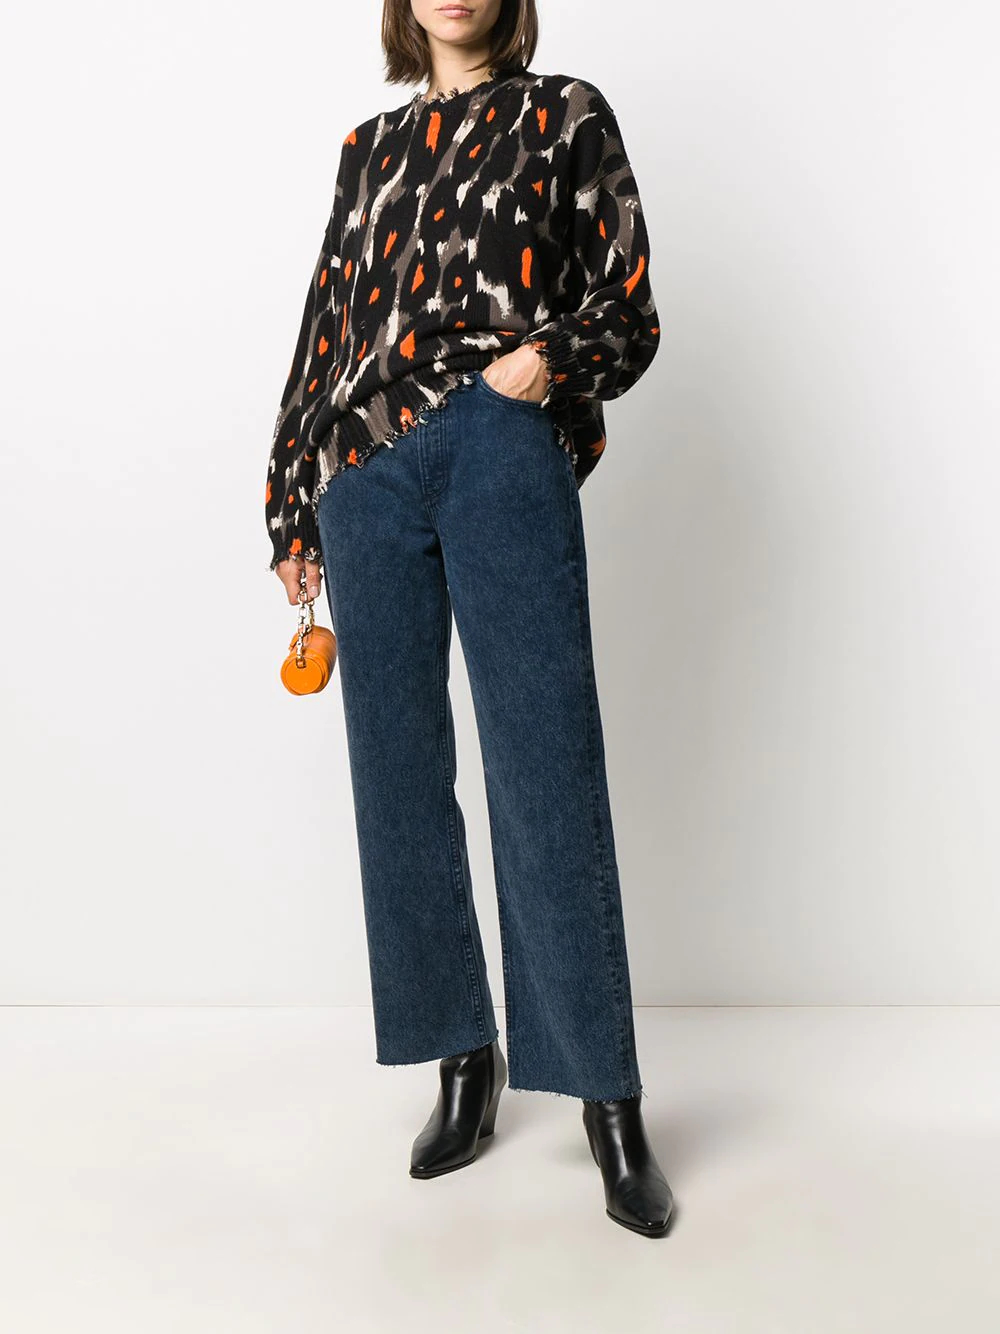 RAG & BONE | Rag & Bone прямые джинсы Ruth с завышенной талией | Clouty